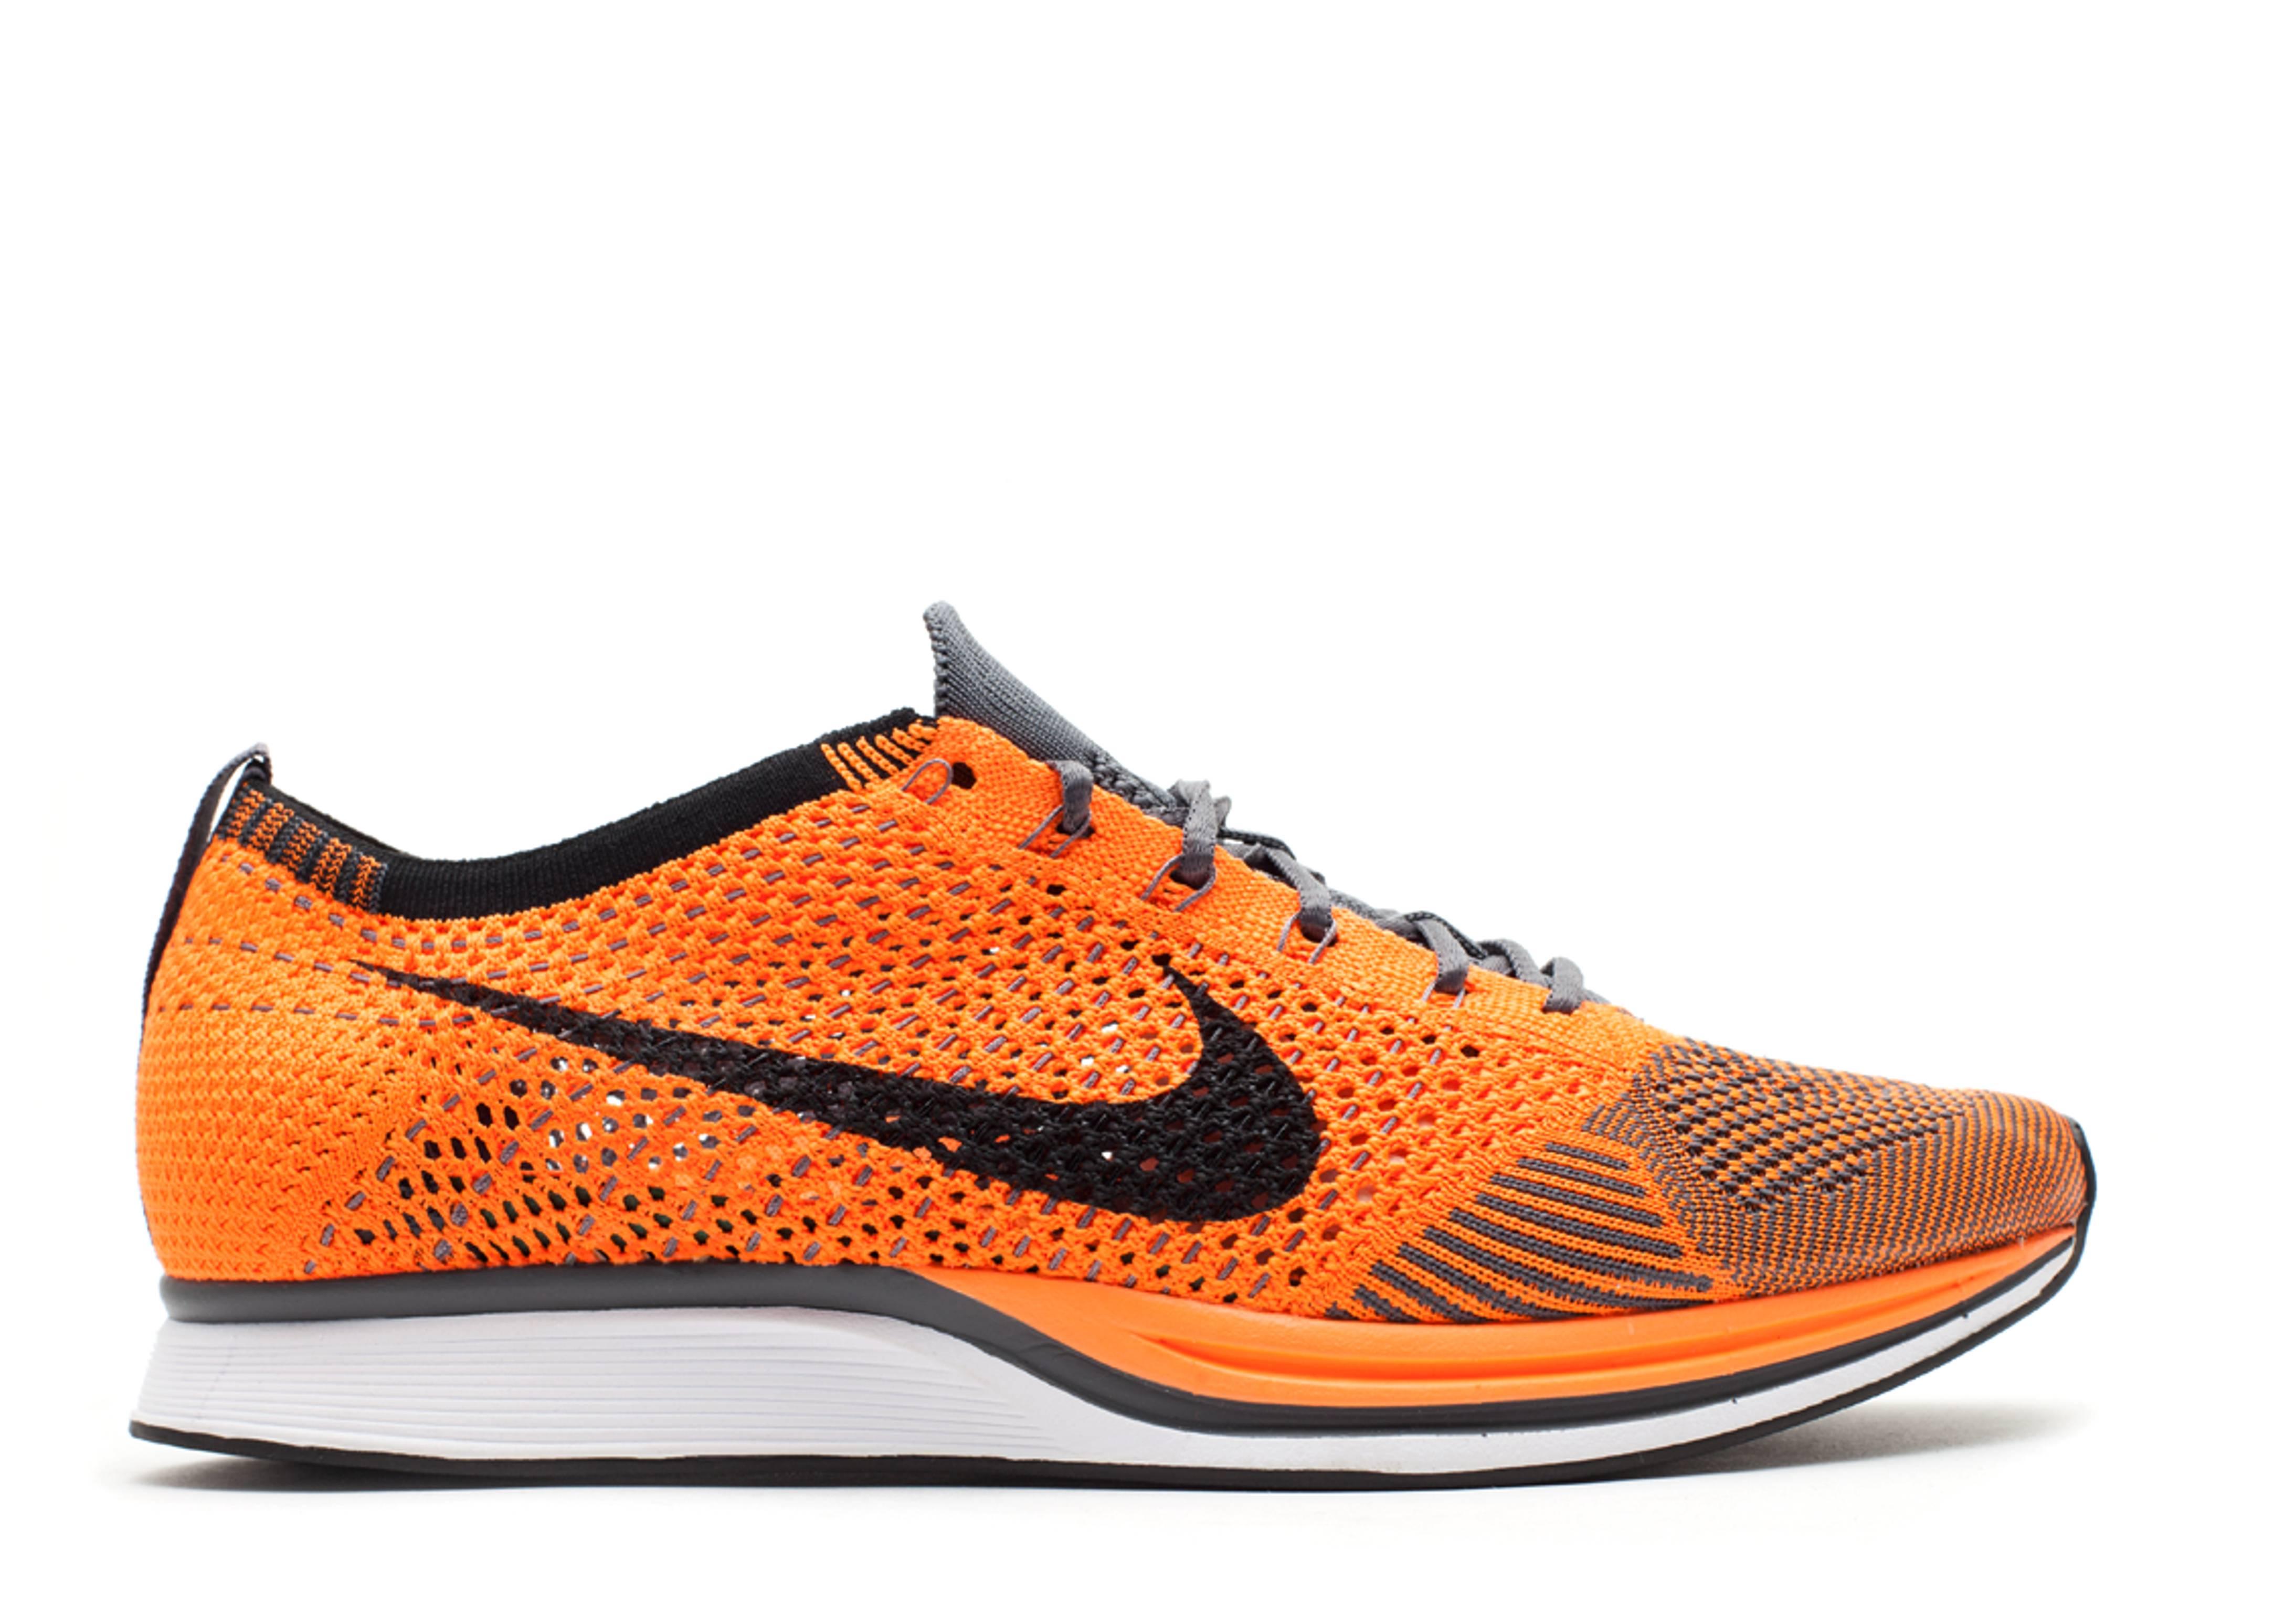 e95fee3a5f482 Flyknit Racer - Nike - 526628 810 - total orange white-dark grey ...